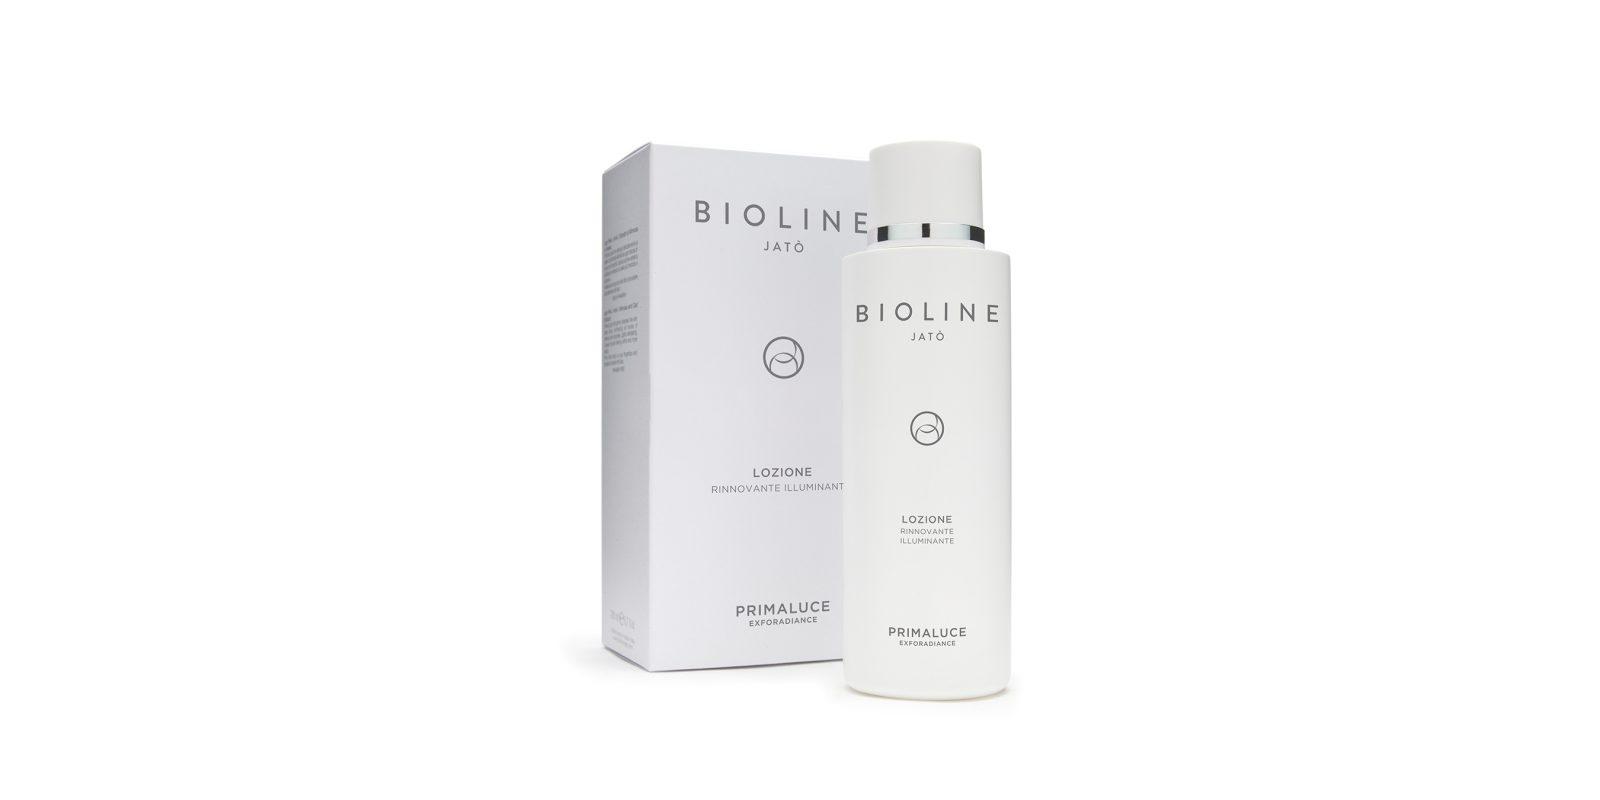 bioline primaluce exforadiance hydrating renovating cream